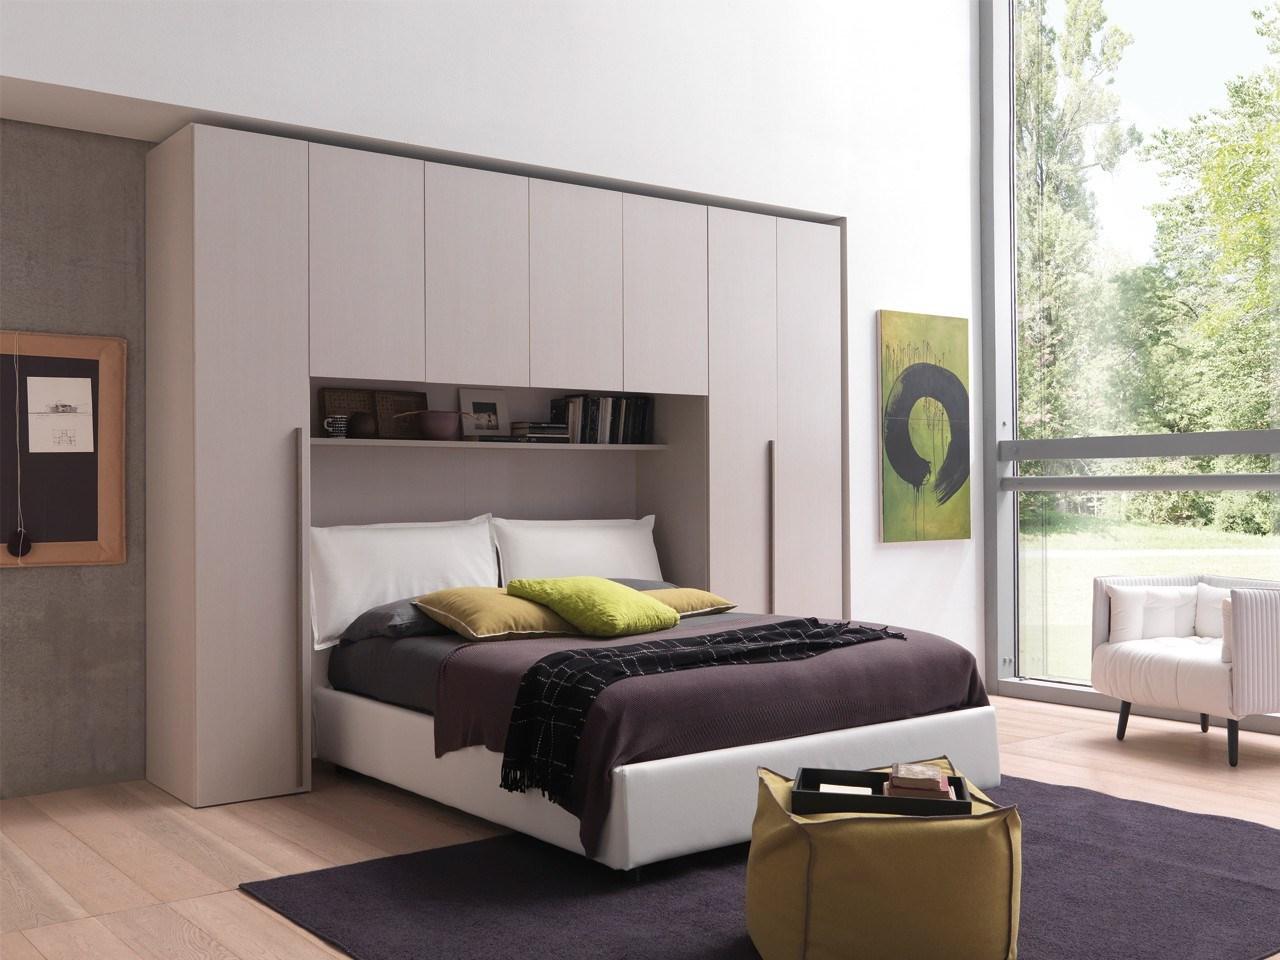 Muebles Castellon Baratos E9dx Muebles Castellon Baratos top Free Affordable Y Dormitorios